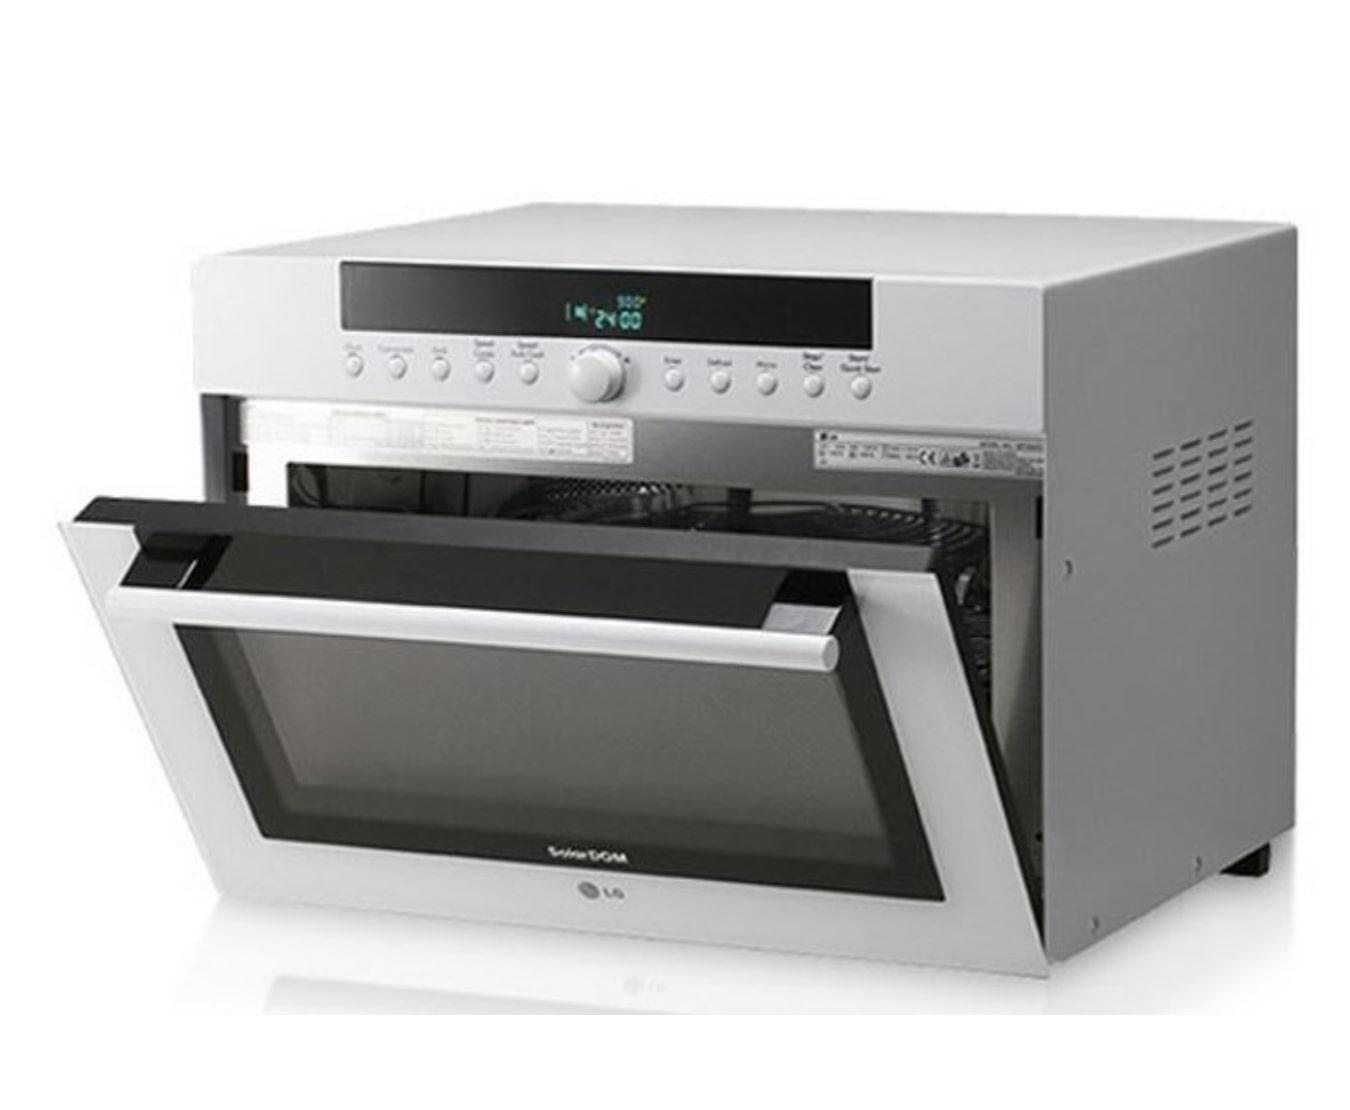 Lg Mp 9485s 34l Silver Solardom Microwave Oven Lg Za